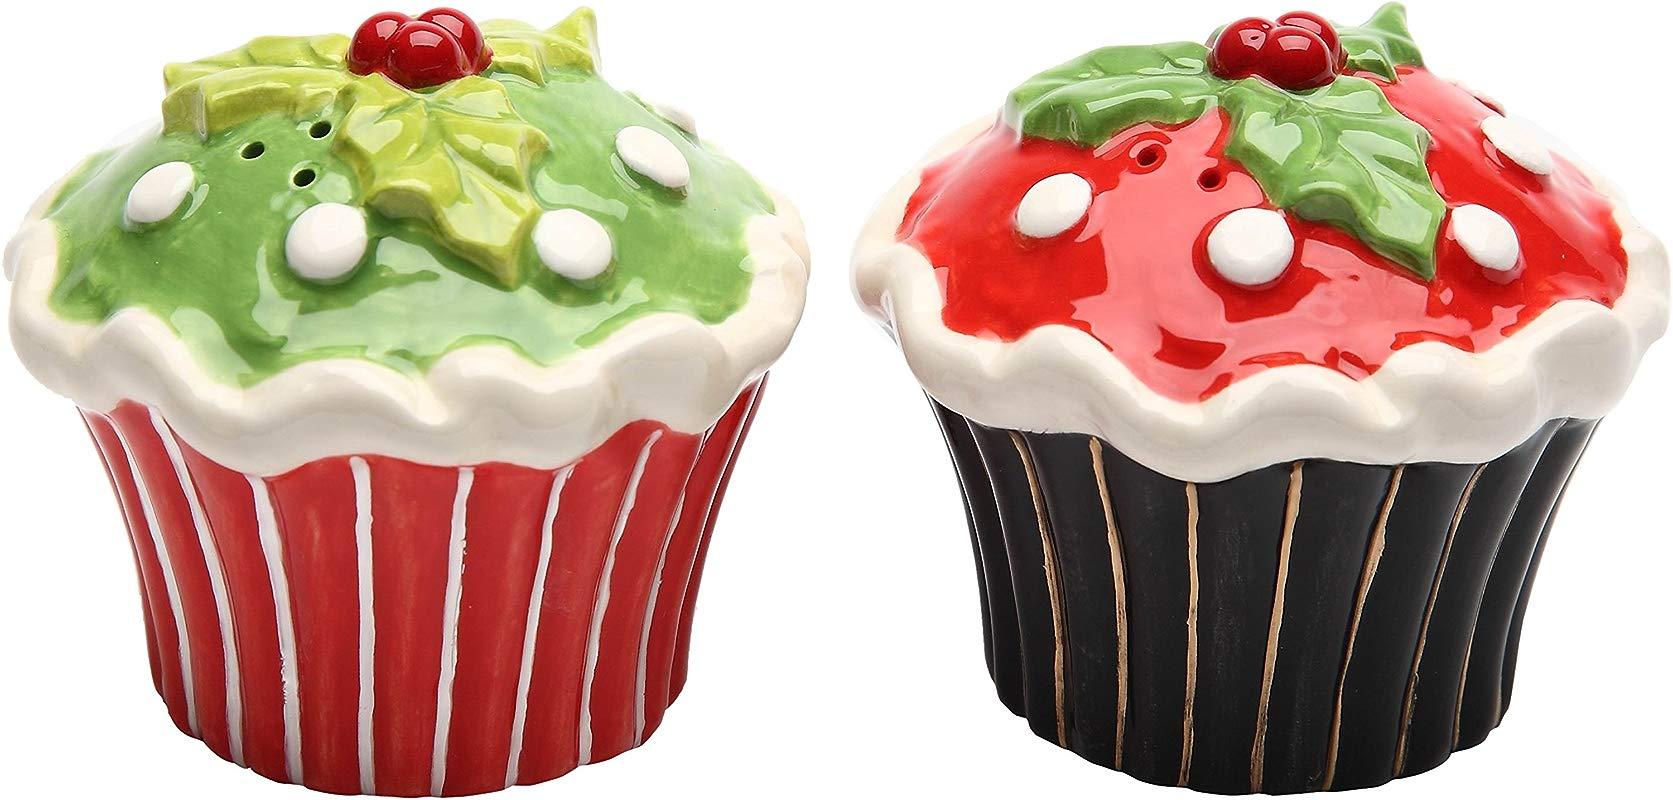 Cosmos 61829 Gifts Ceramic Seasonal Cupcake Salt And Pepper Set 2 5 8 Inch